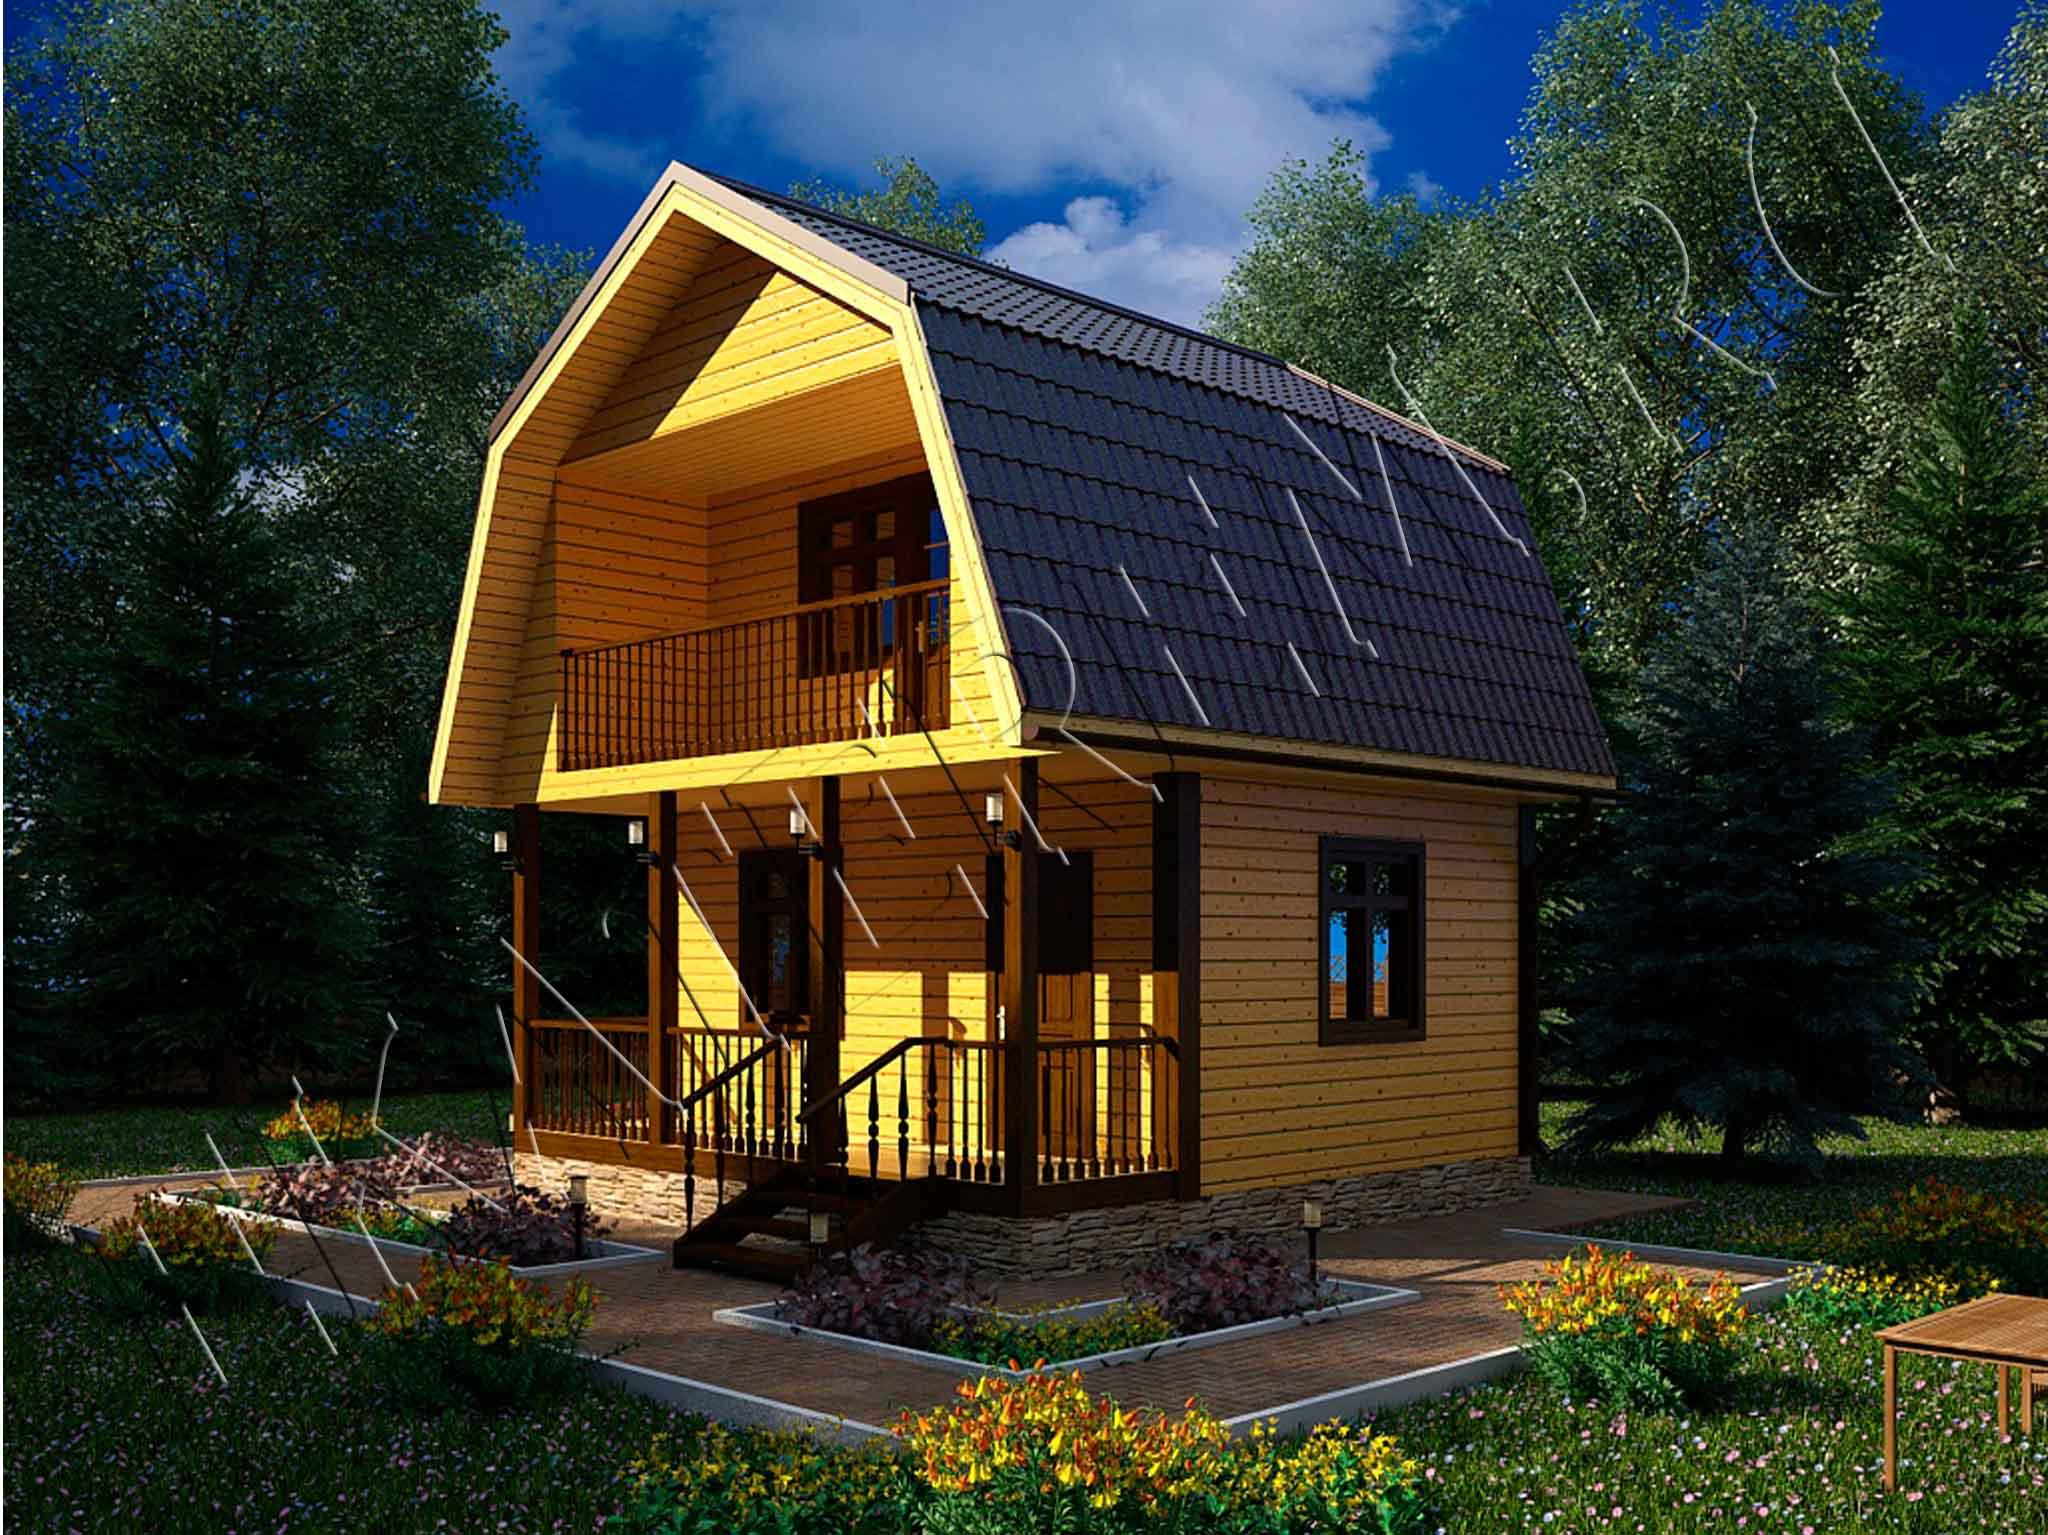 Проект н-22: дом из бруса 6х6 м. 290 000 рублей - екатерем.